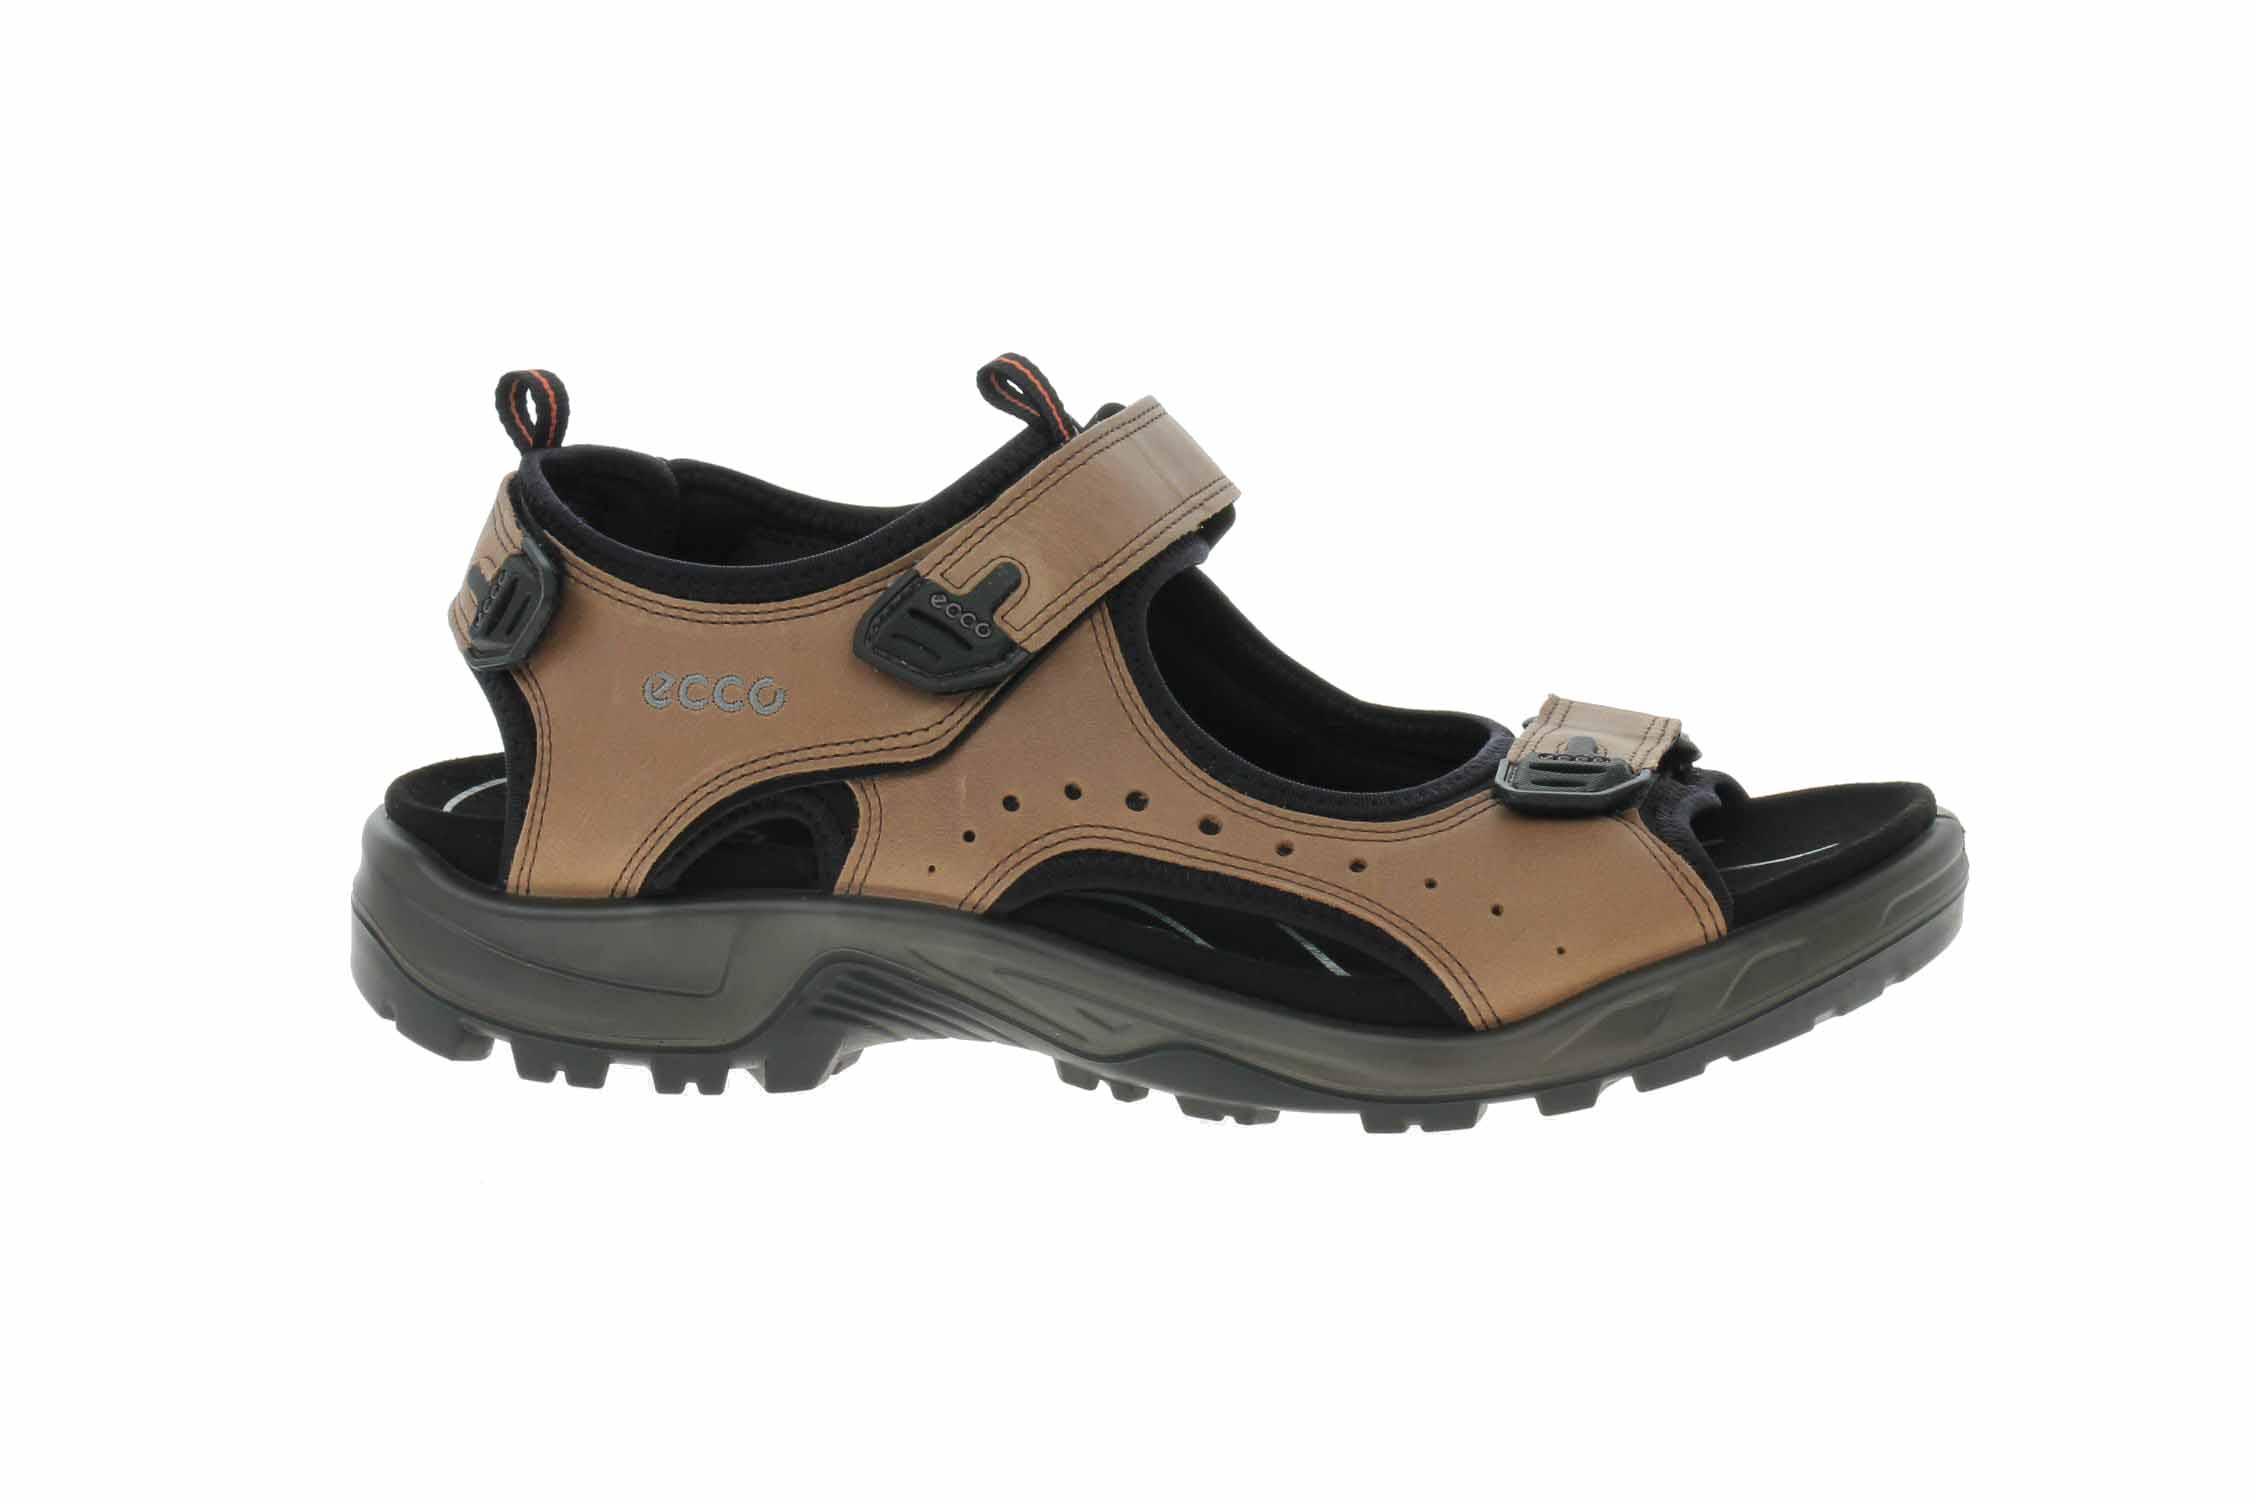 b783e3d2b315 Ecco Offroad pánské sandály 82204402114 navajo brown velikost 44